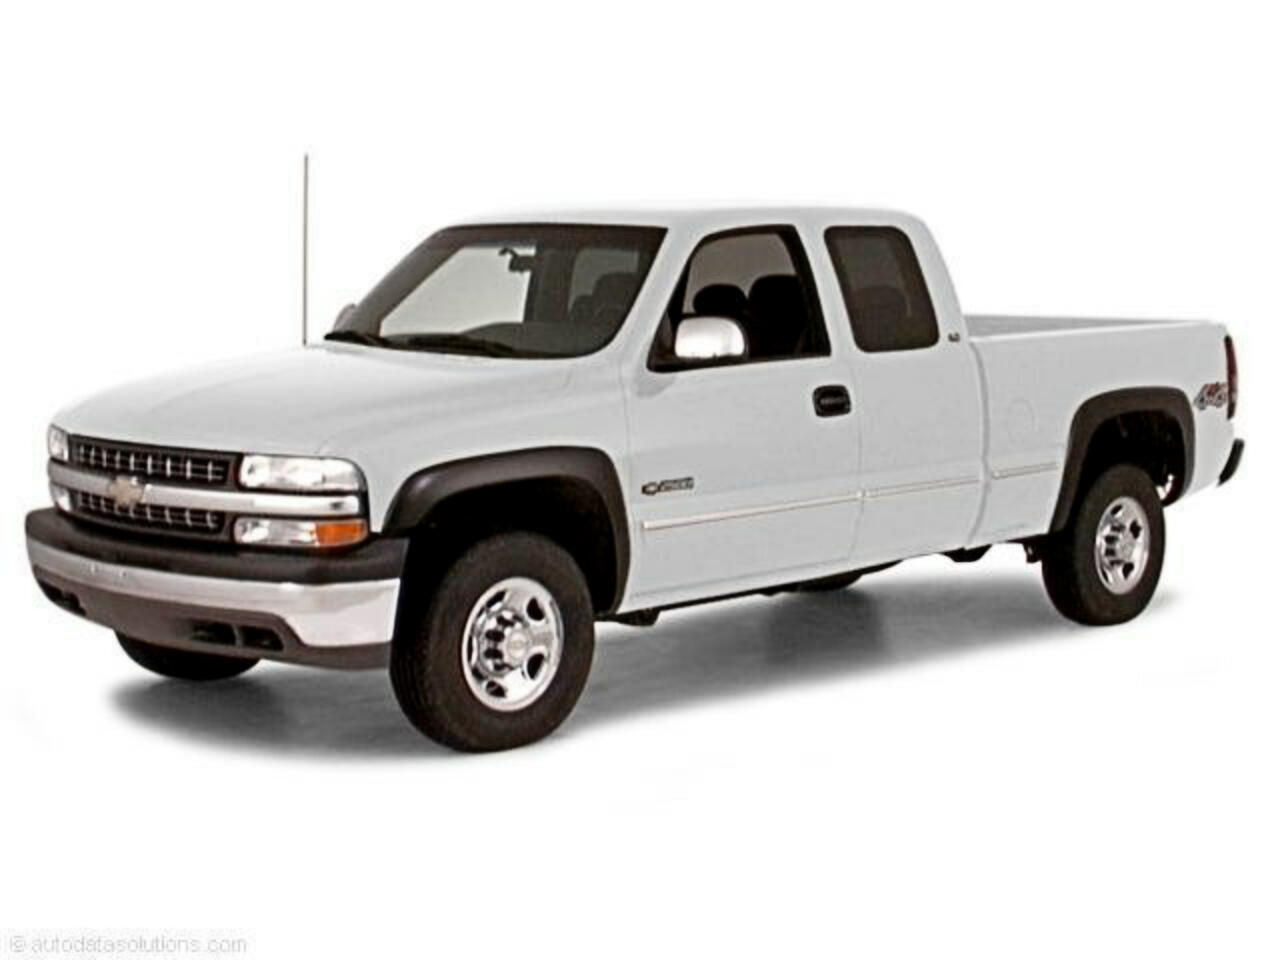 2000 Chevrolet Silverado 2500 3dr Ext Cab 143.5